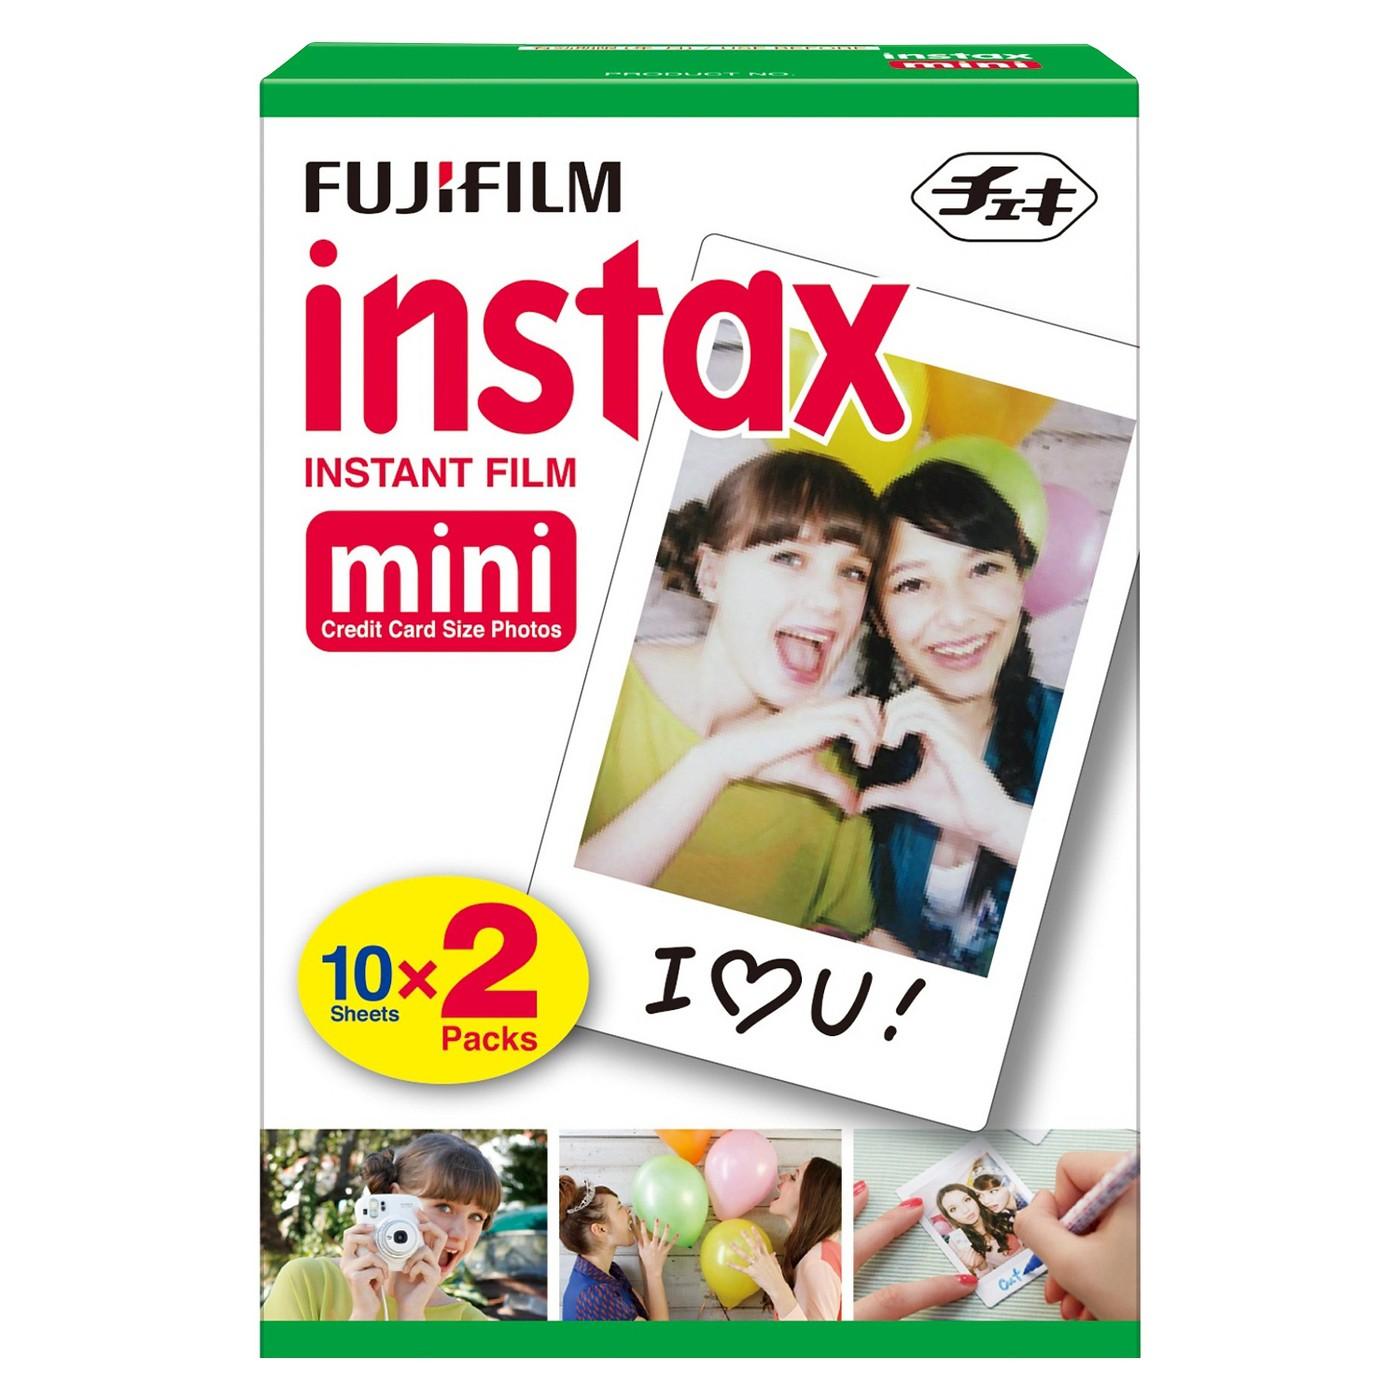 Fujifilm Instax Mini Instant Film Twin Pack - White (16437396)